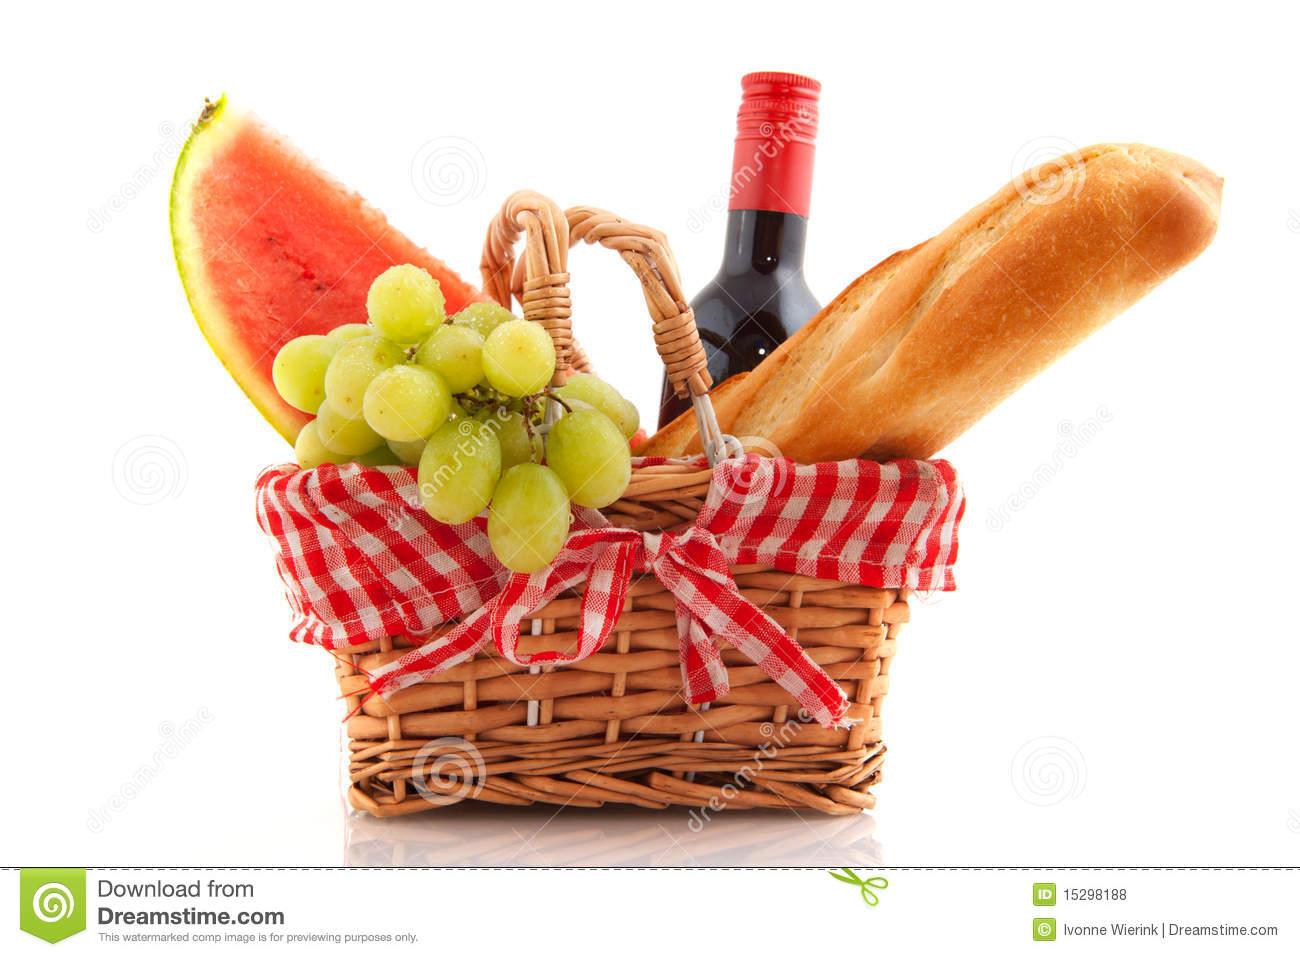 Picnic Basket Food : Picnic basket with food clip art